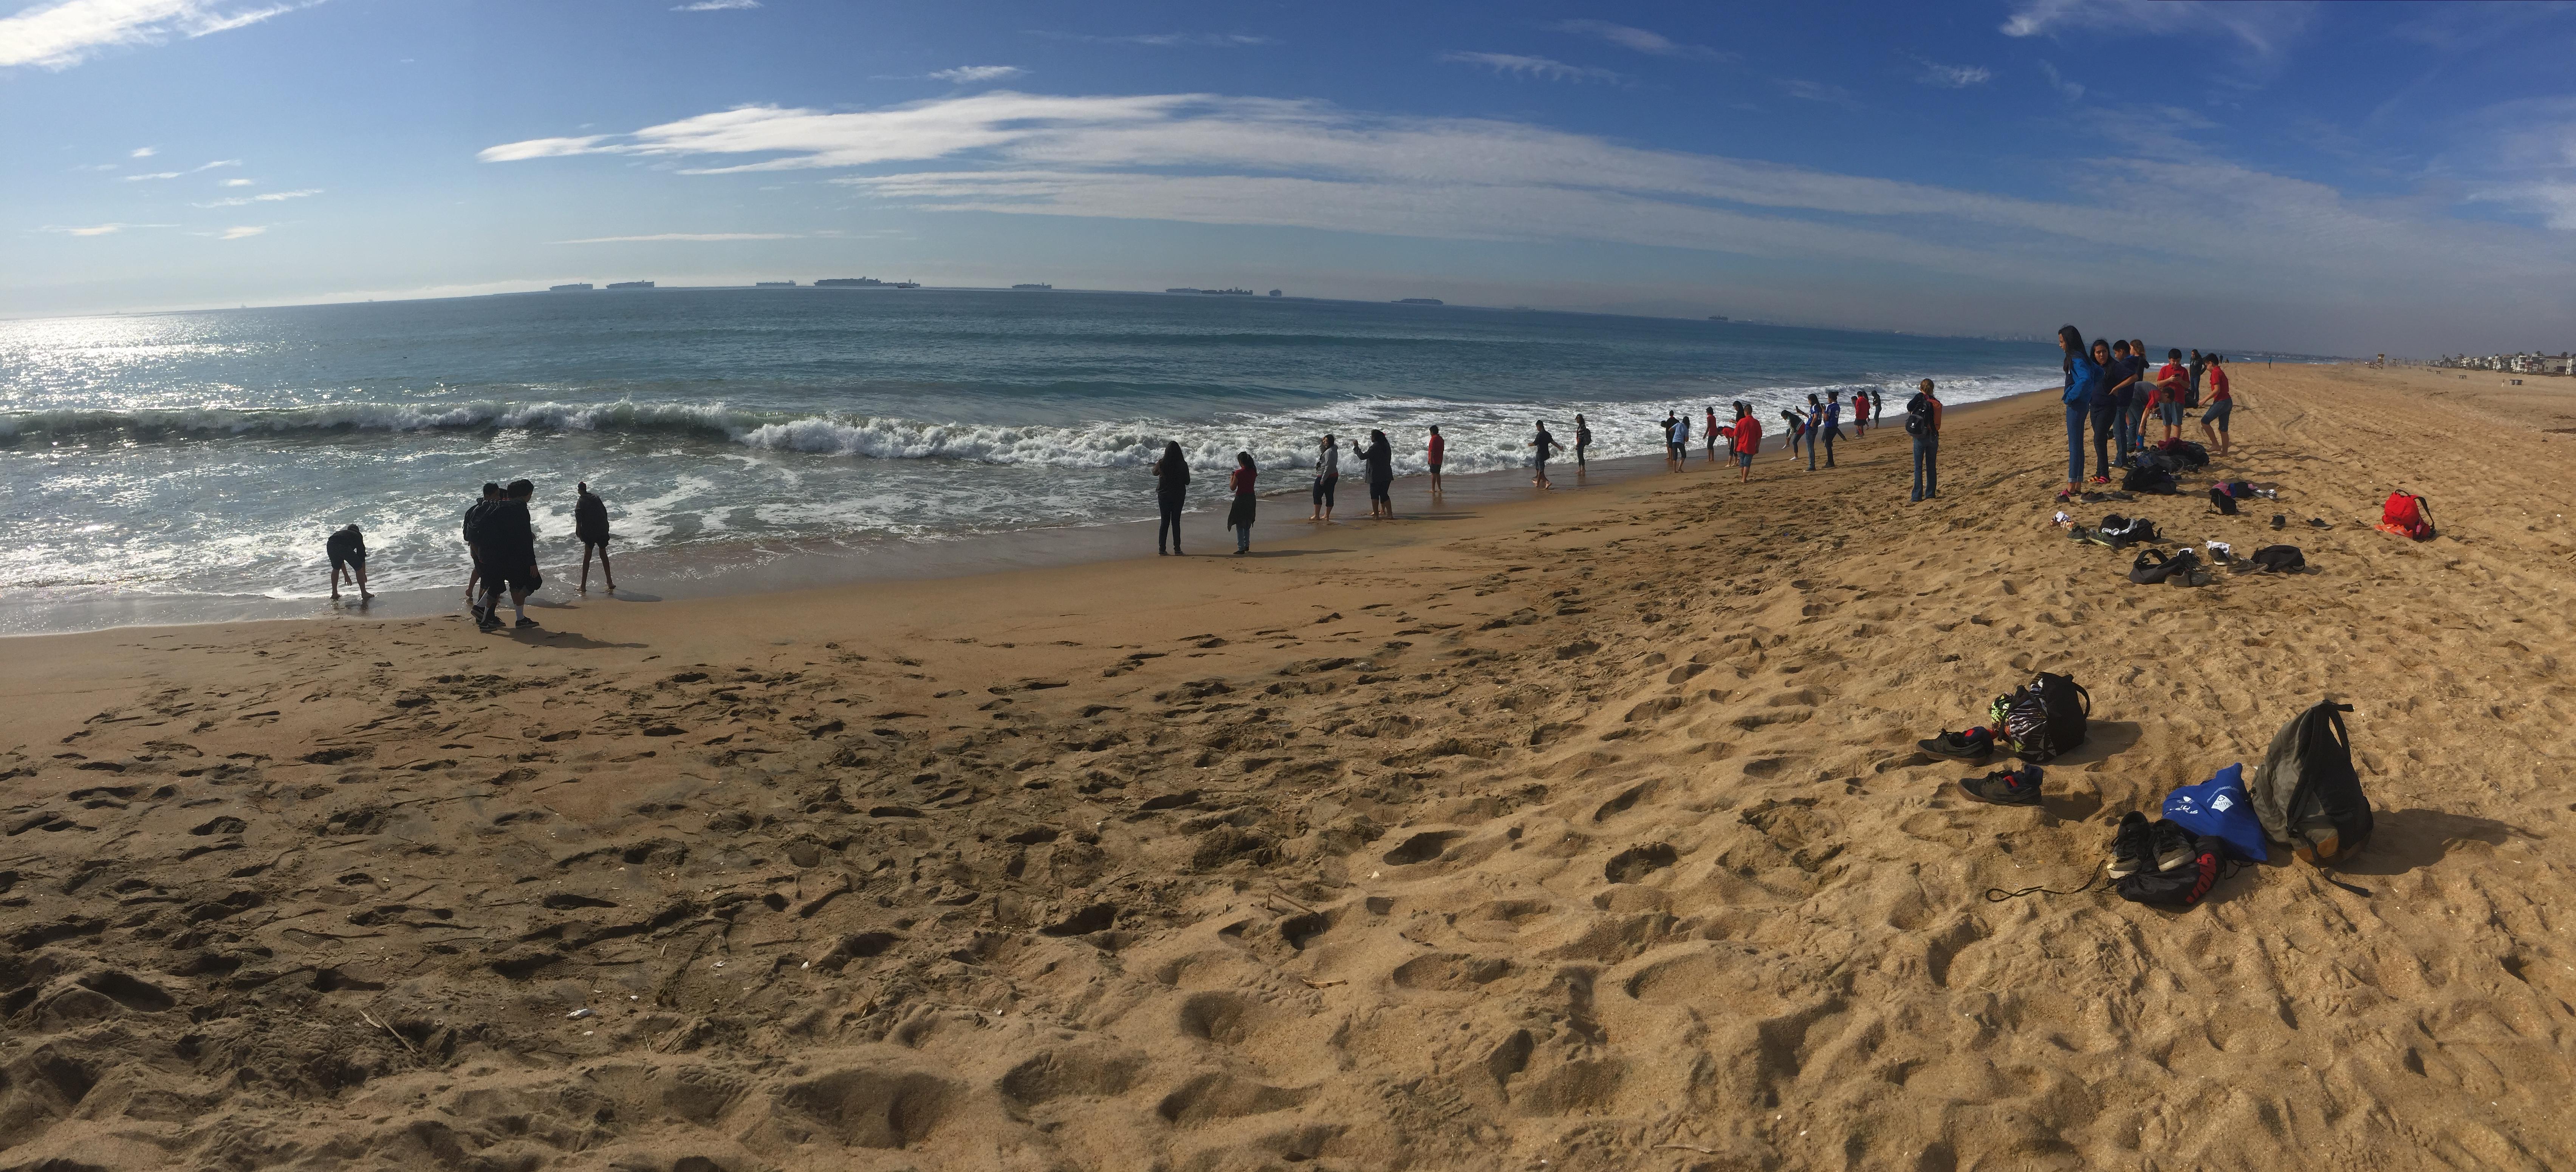 Students enjoying Bolsa Chica State Beach on a field trip